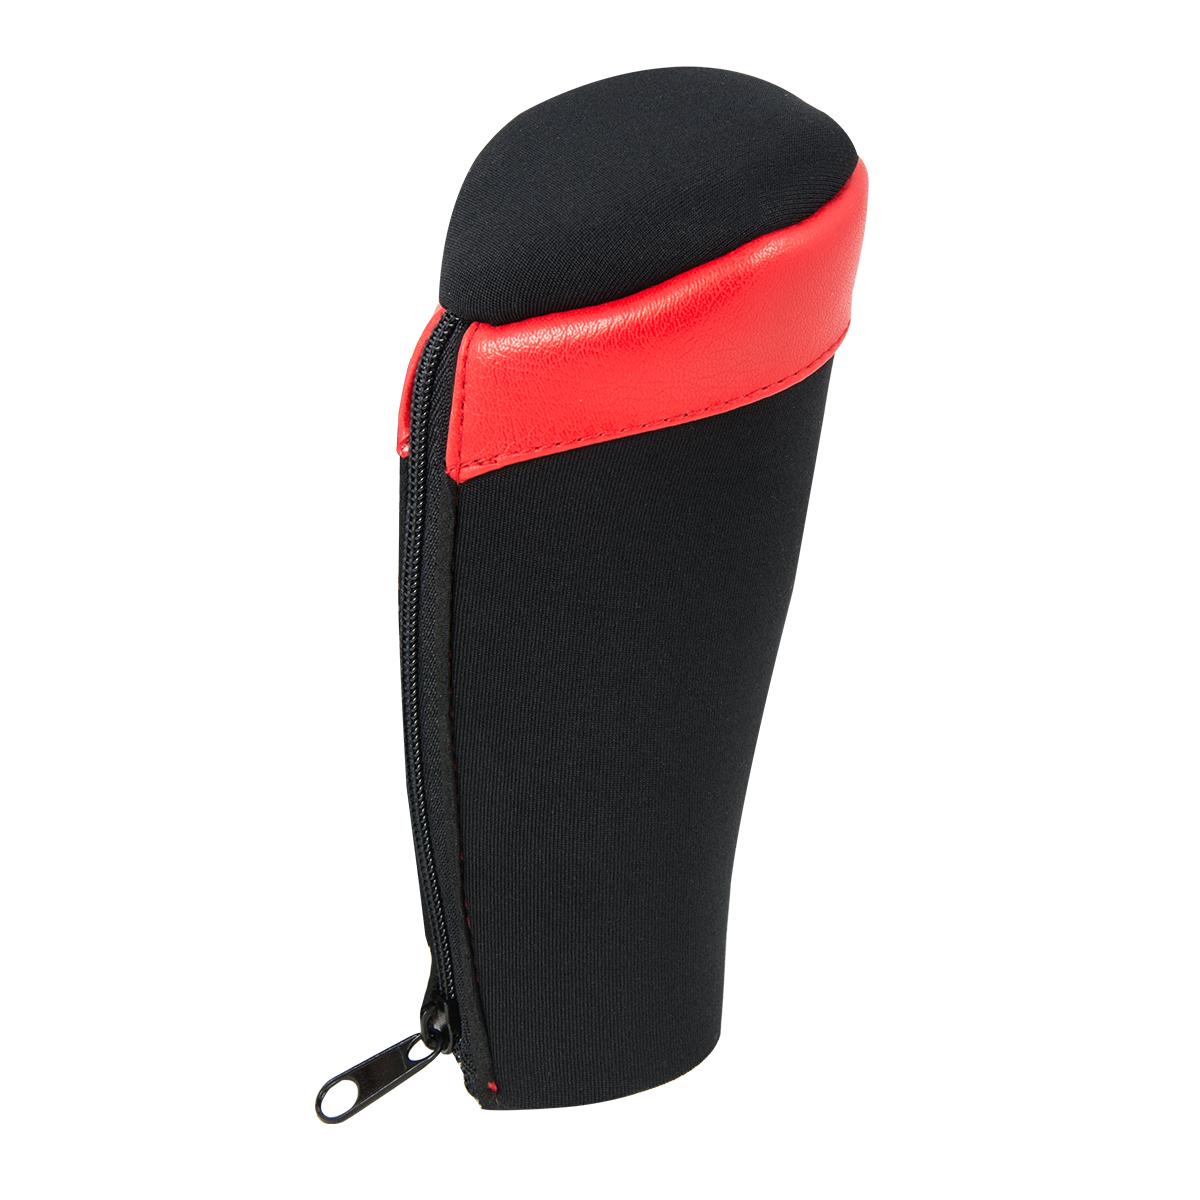 99870 Neoprene Black Gear Shift Knob Cover with Matte Red Trim